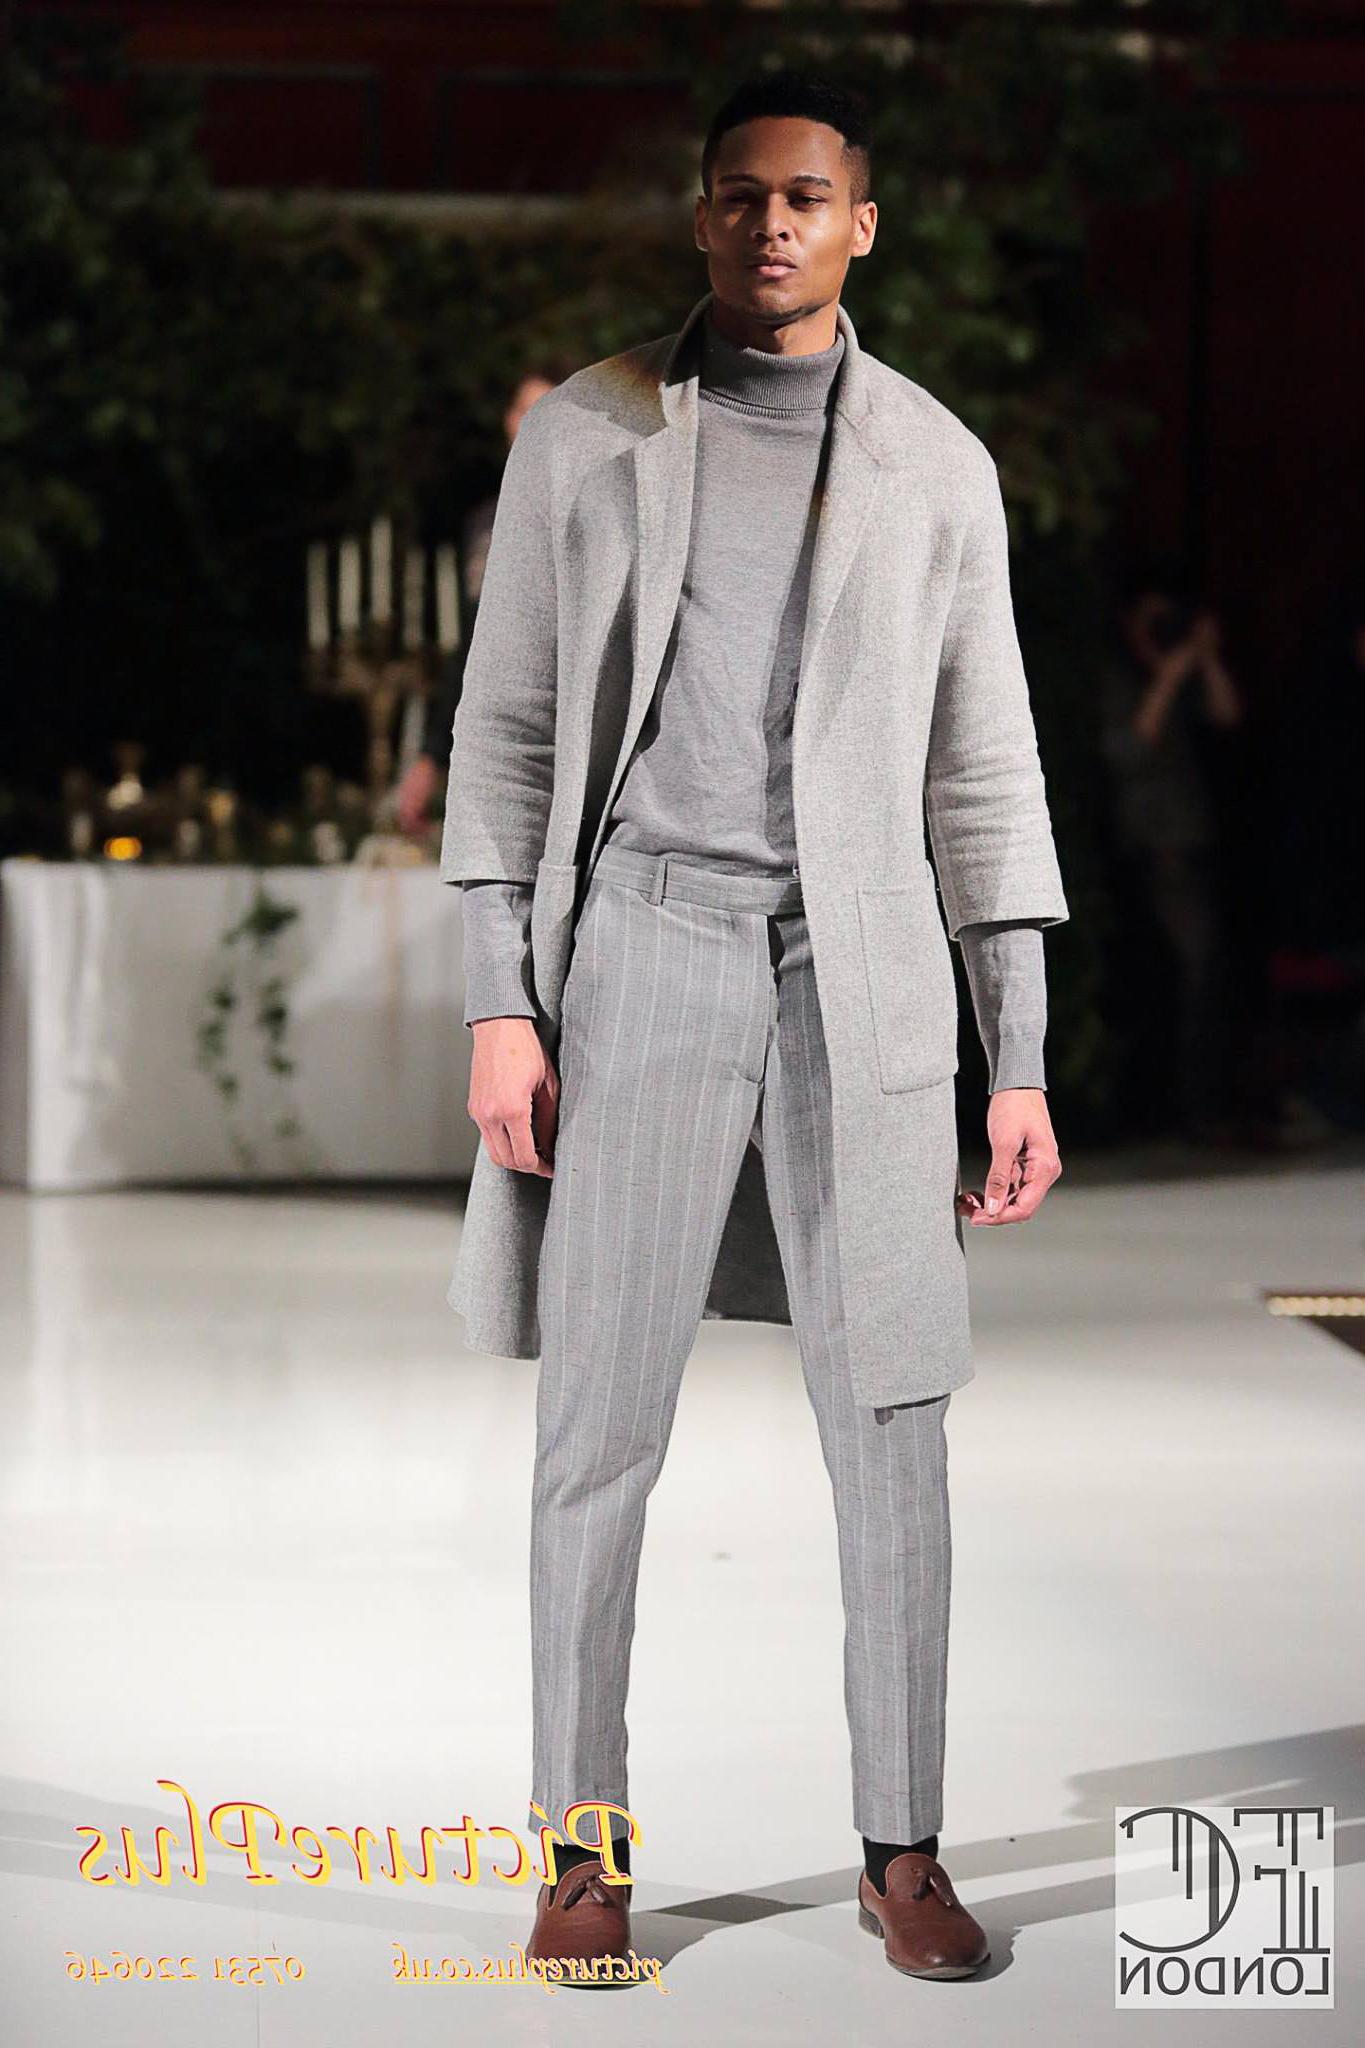 Shine-Male-Model-Terone-London-Catwalk-Editoral-03.jpg#asset:44522